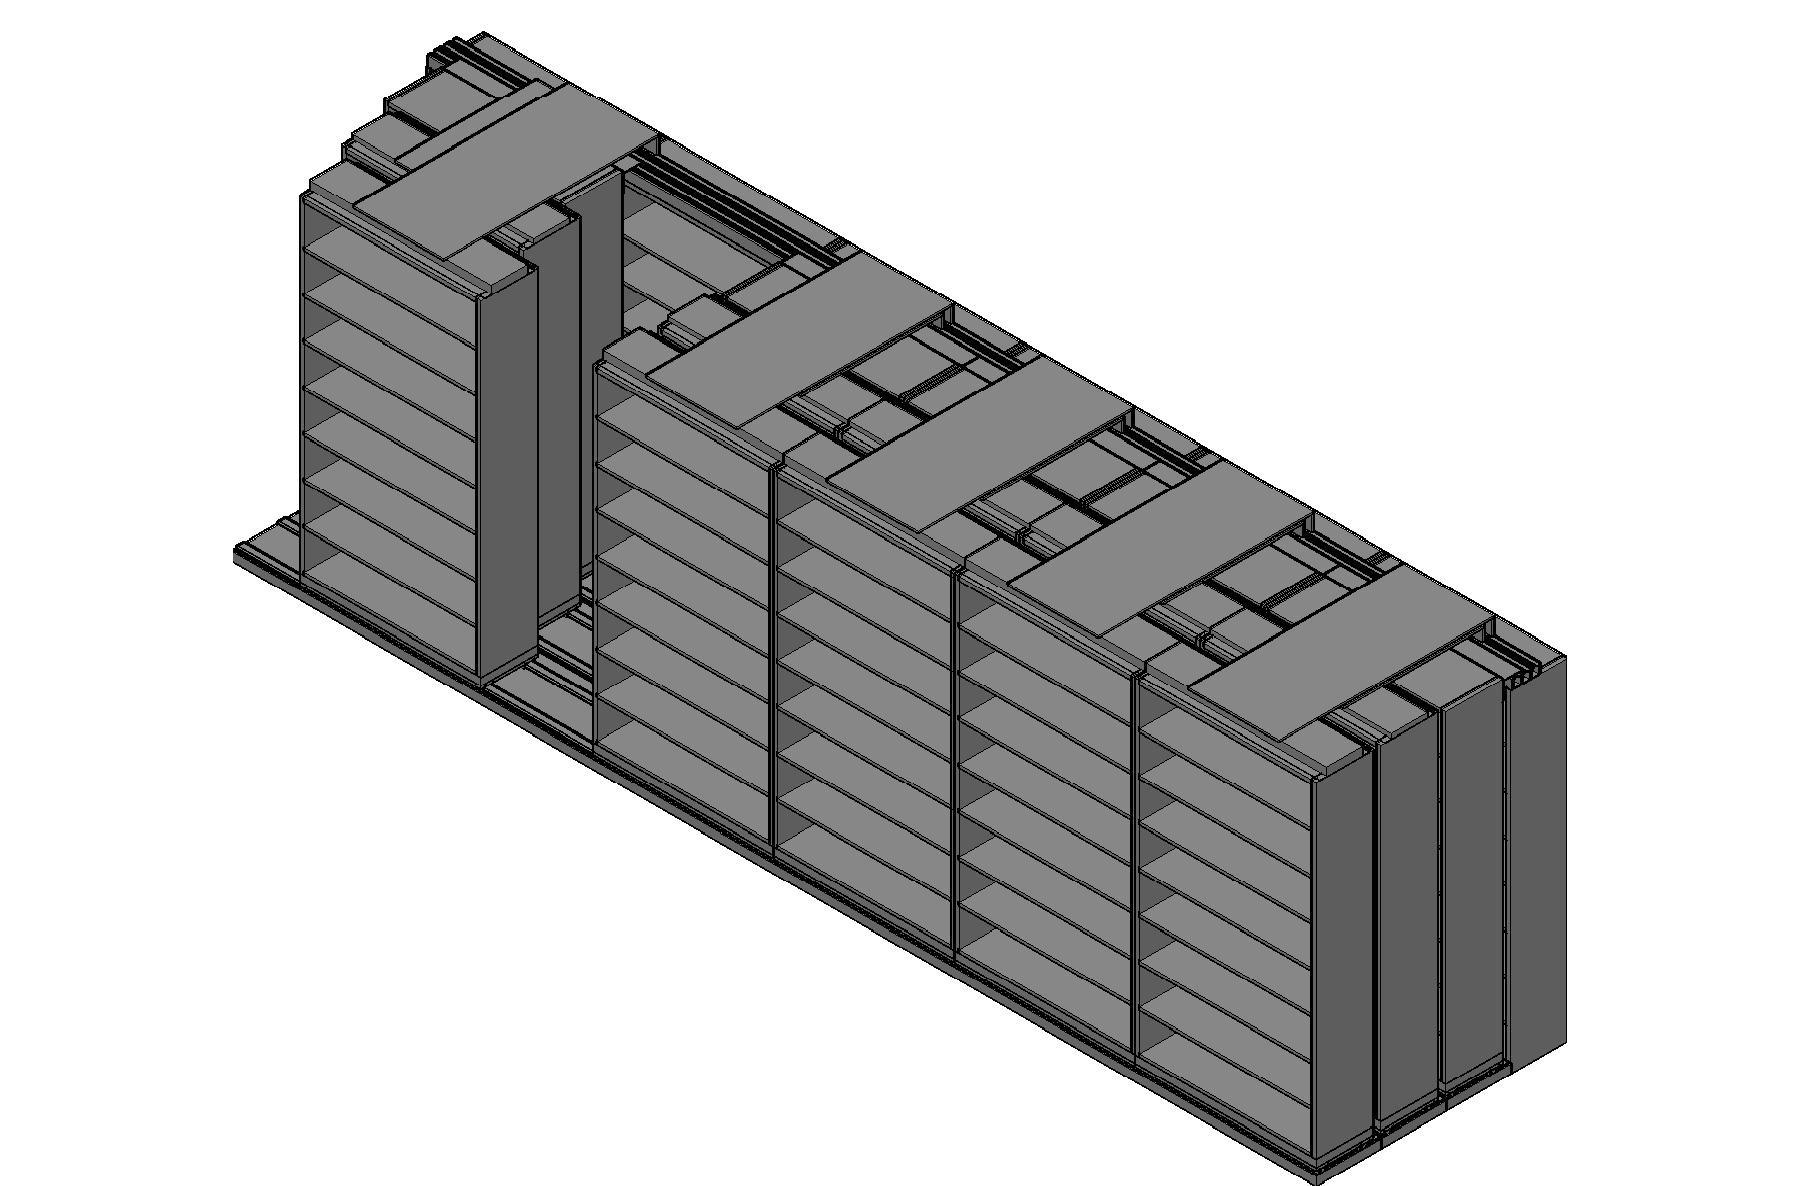 "Legal Size Sliding Shelves - 4 Rows Deep - 8 Levels - (48"" x 15"" Shelves) - 292"" Total Width"